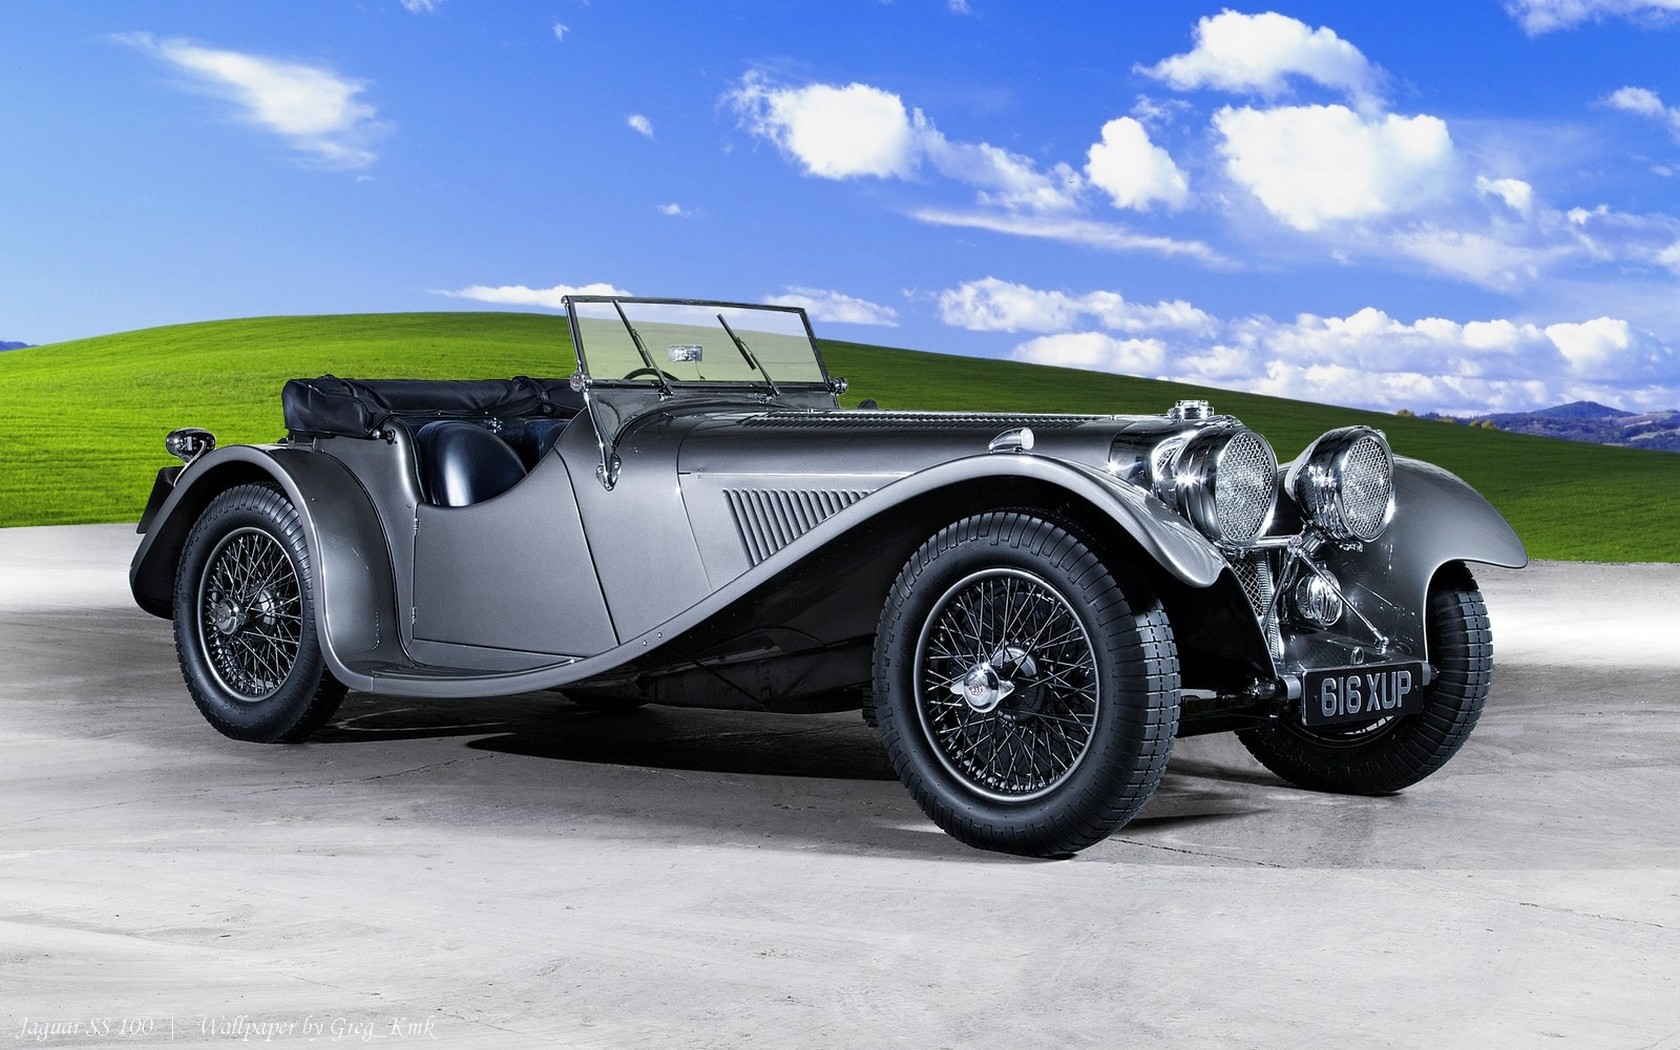 jaguar car wallpaper,land vehicle,vehicle,car,vintage car,classic car